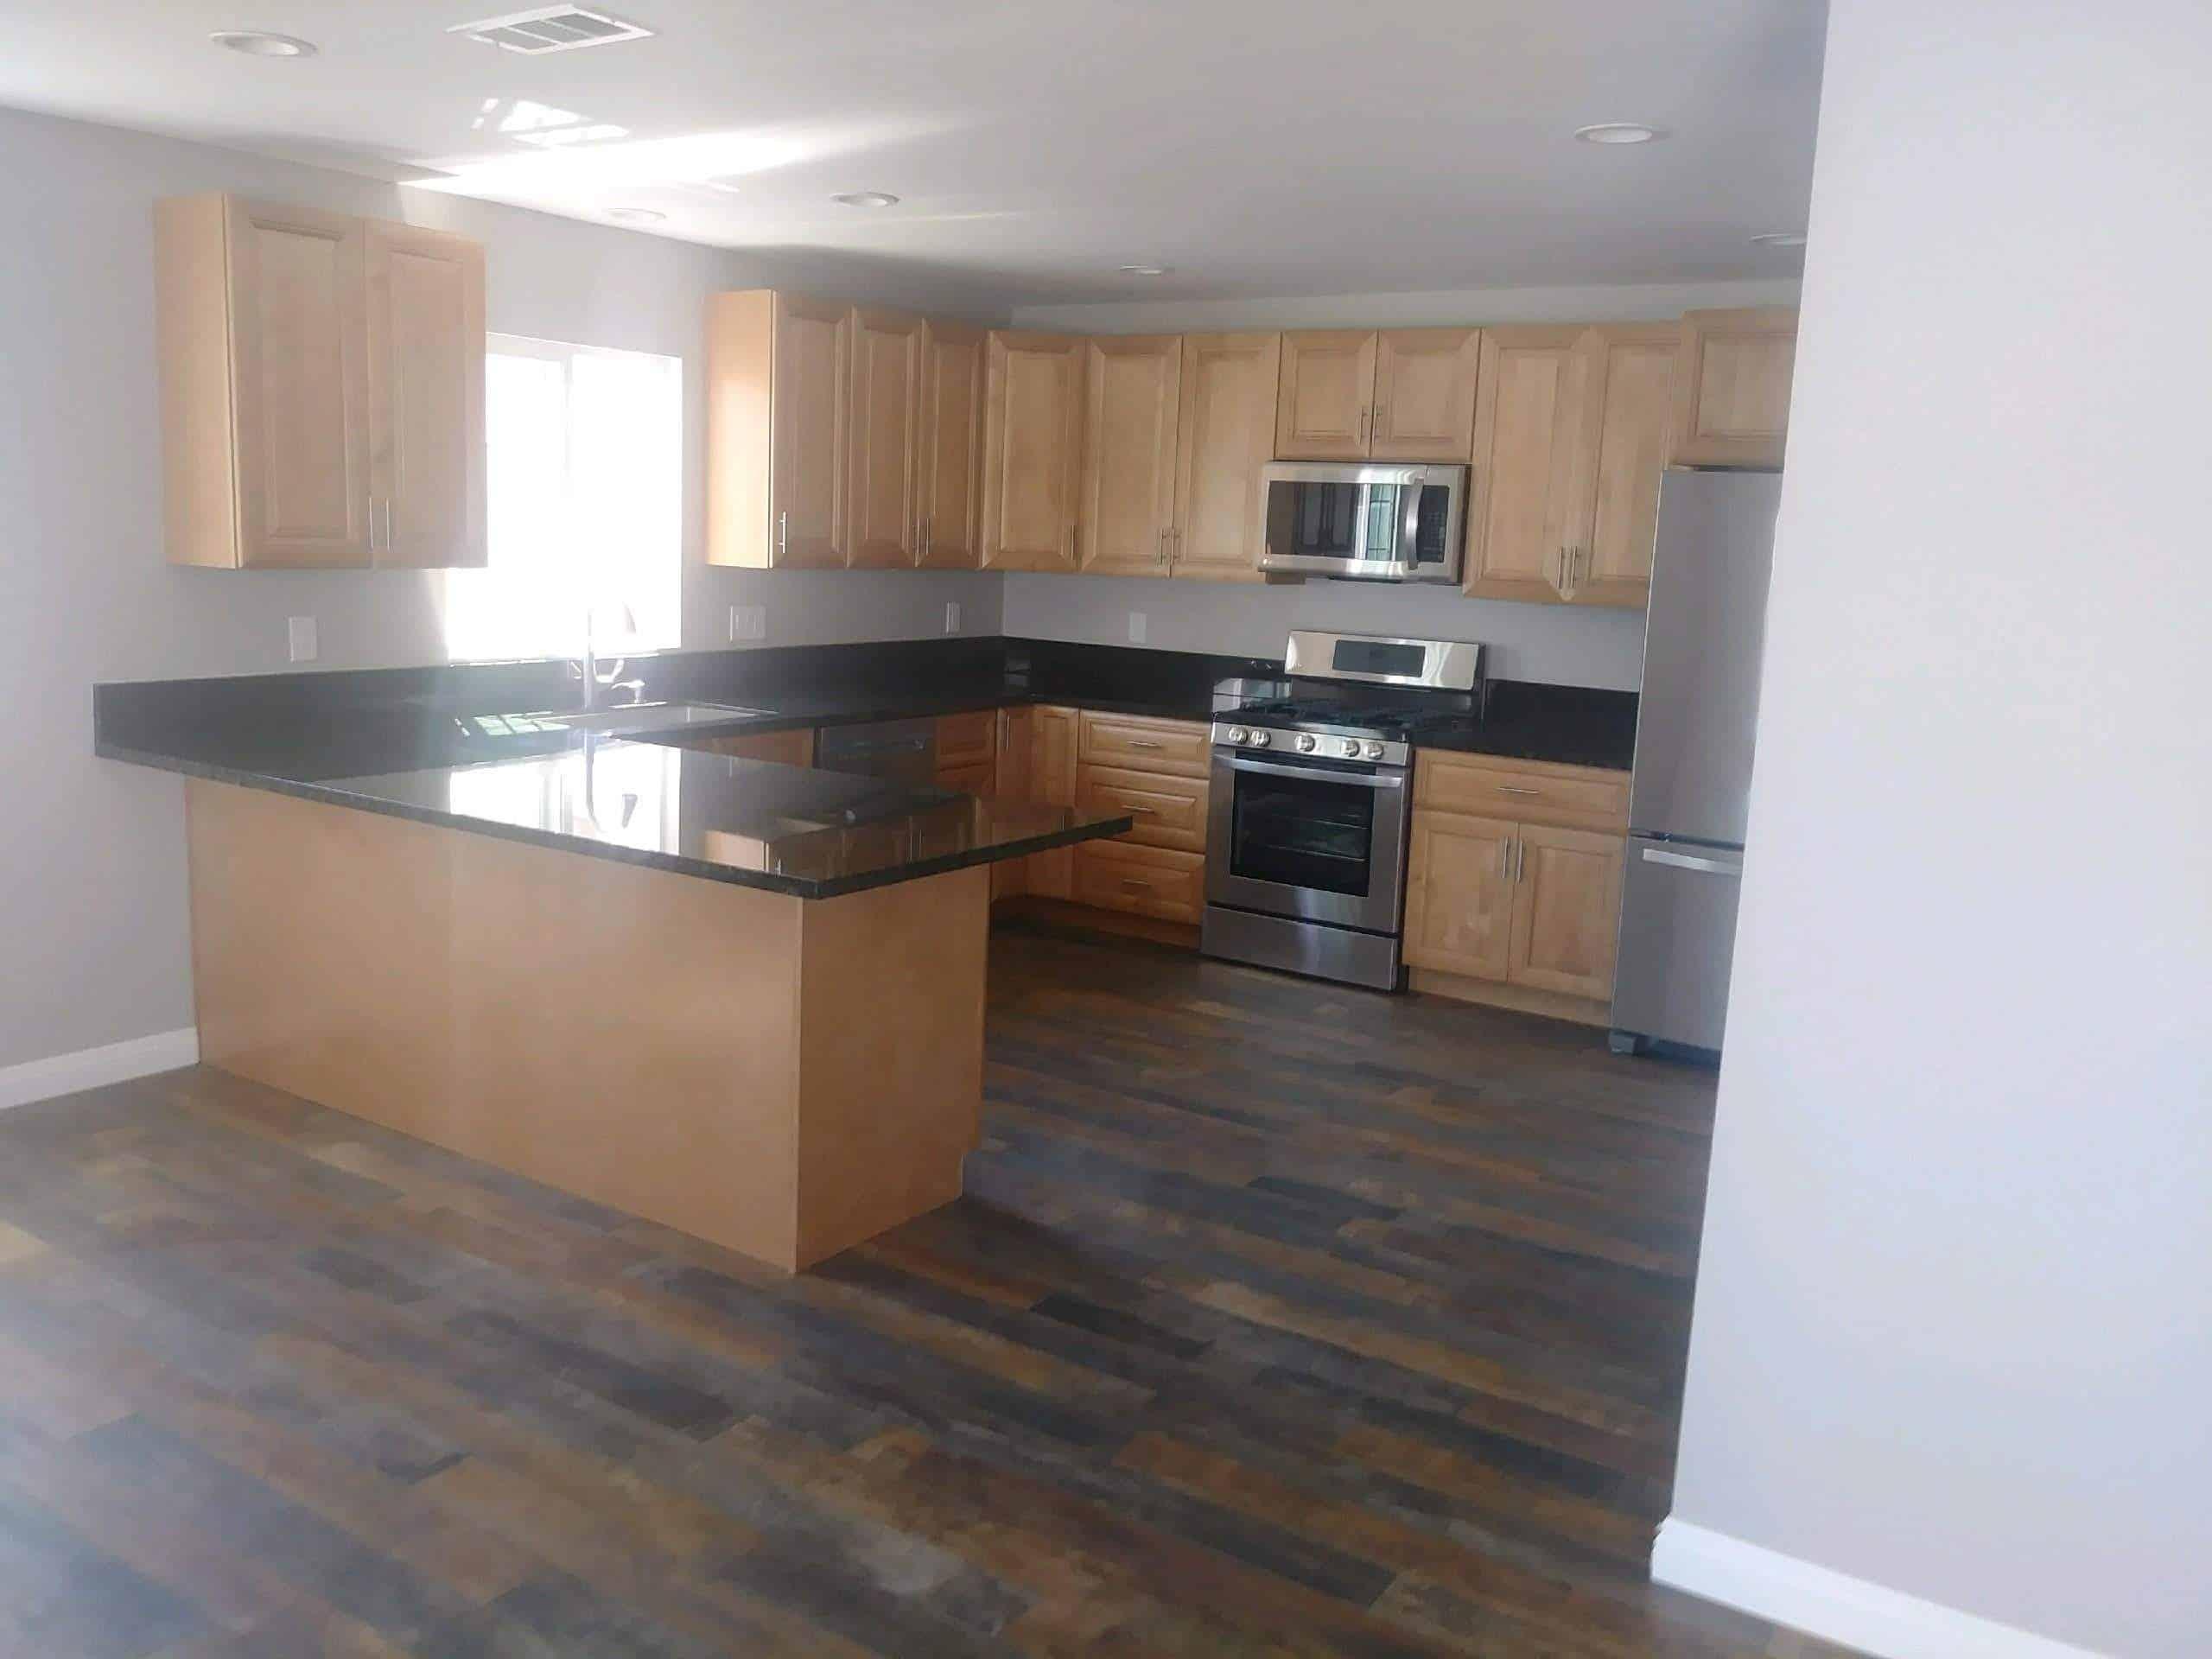 Kitchen_Remodel_2B